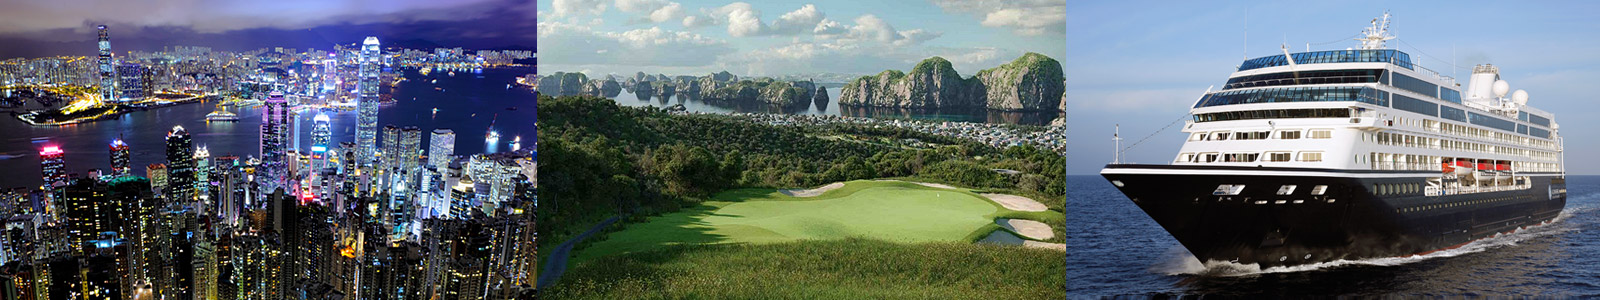 thailand golf championship 2019